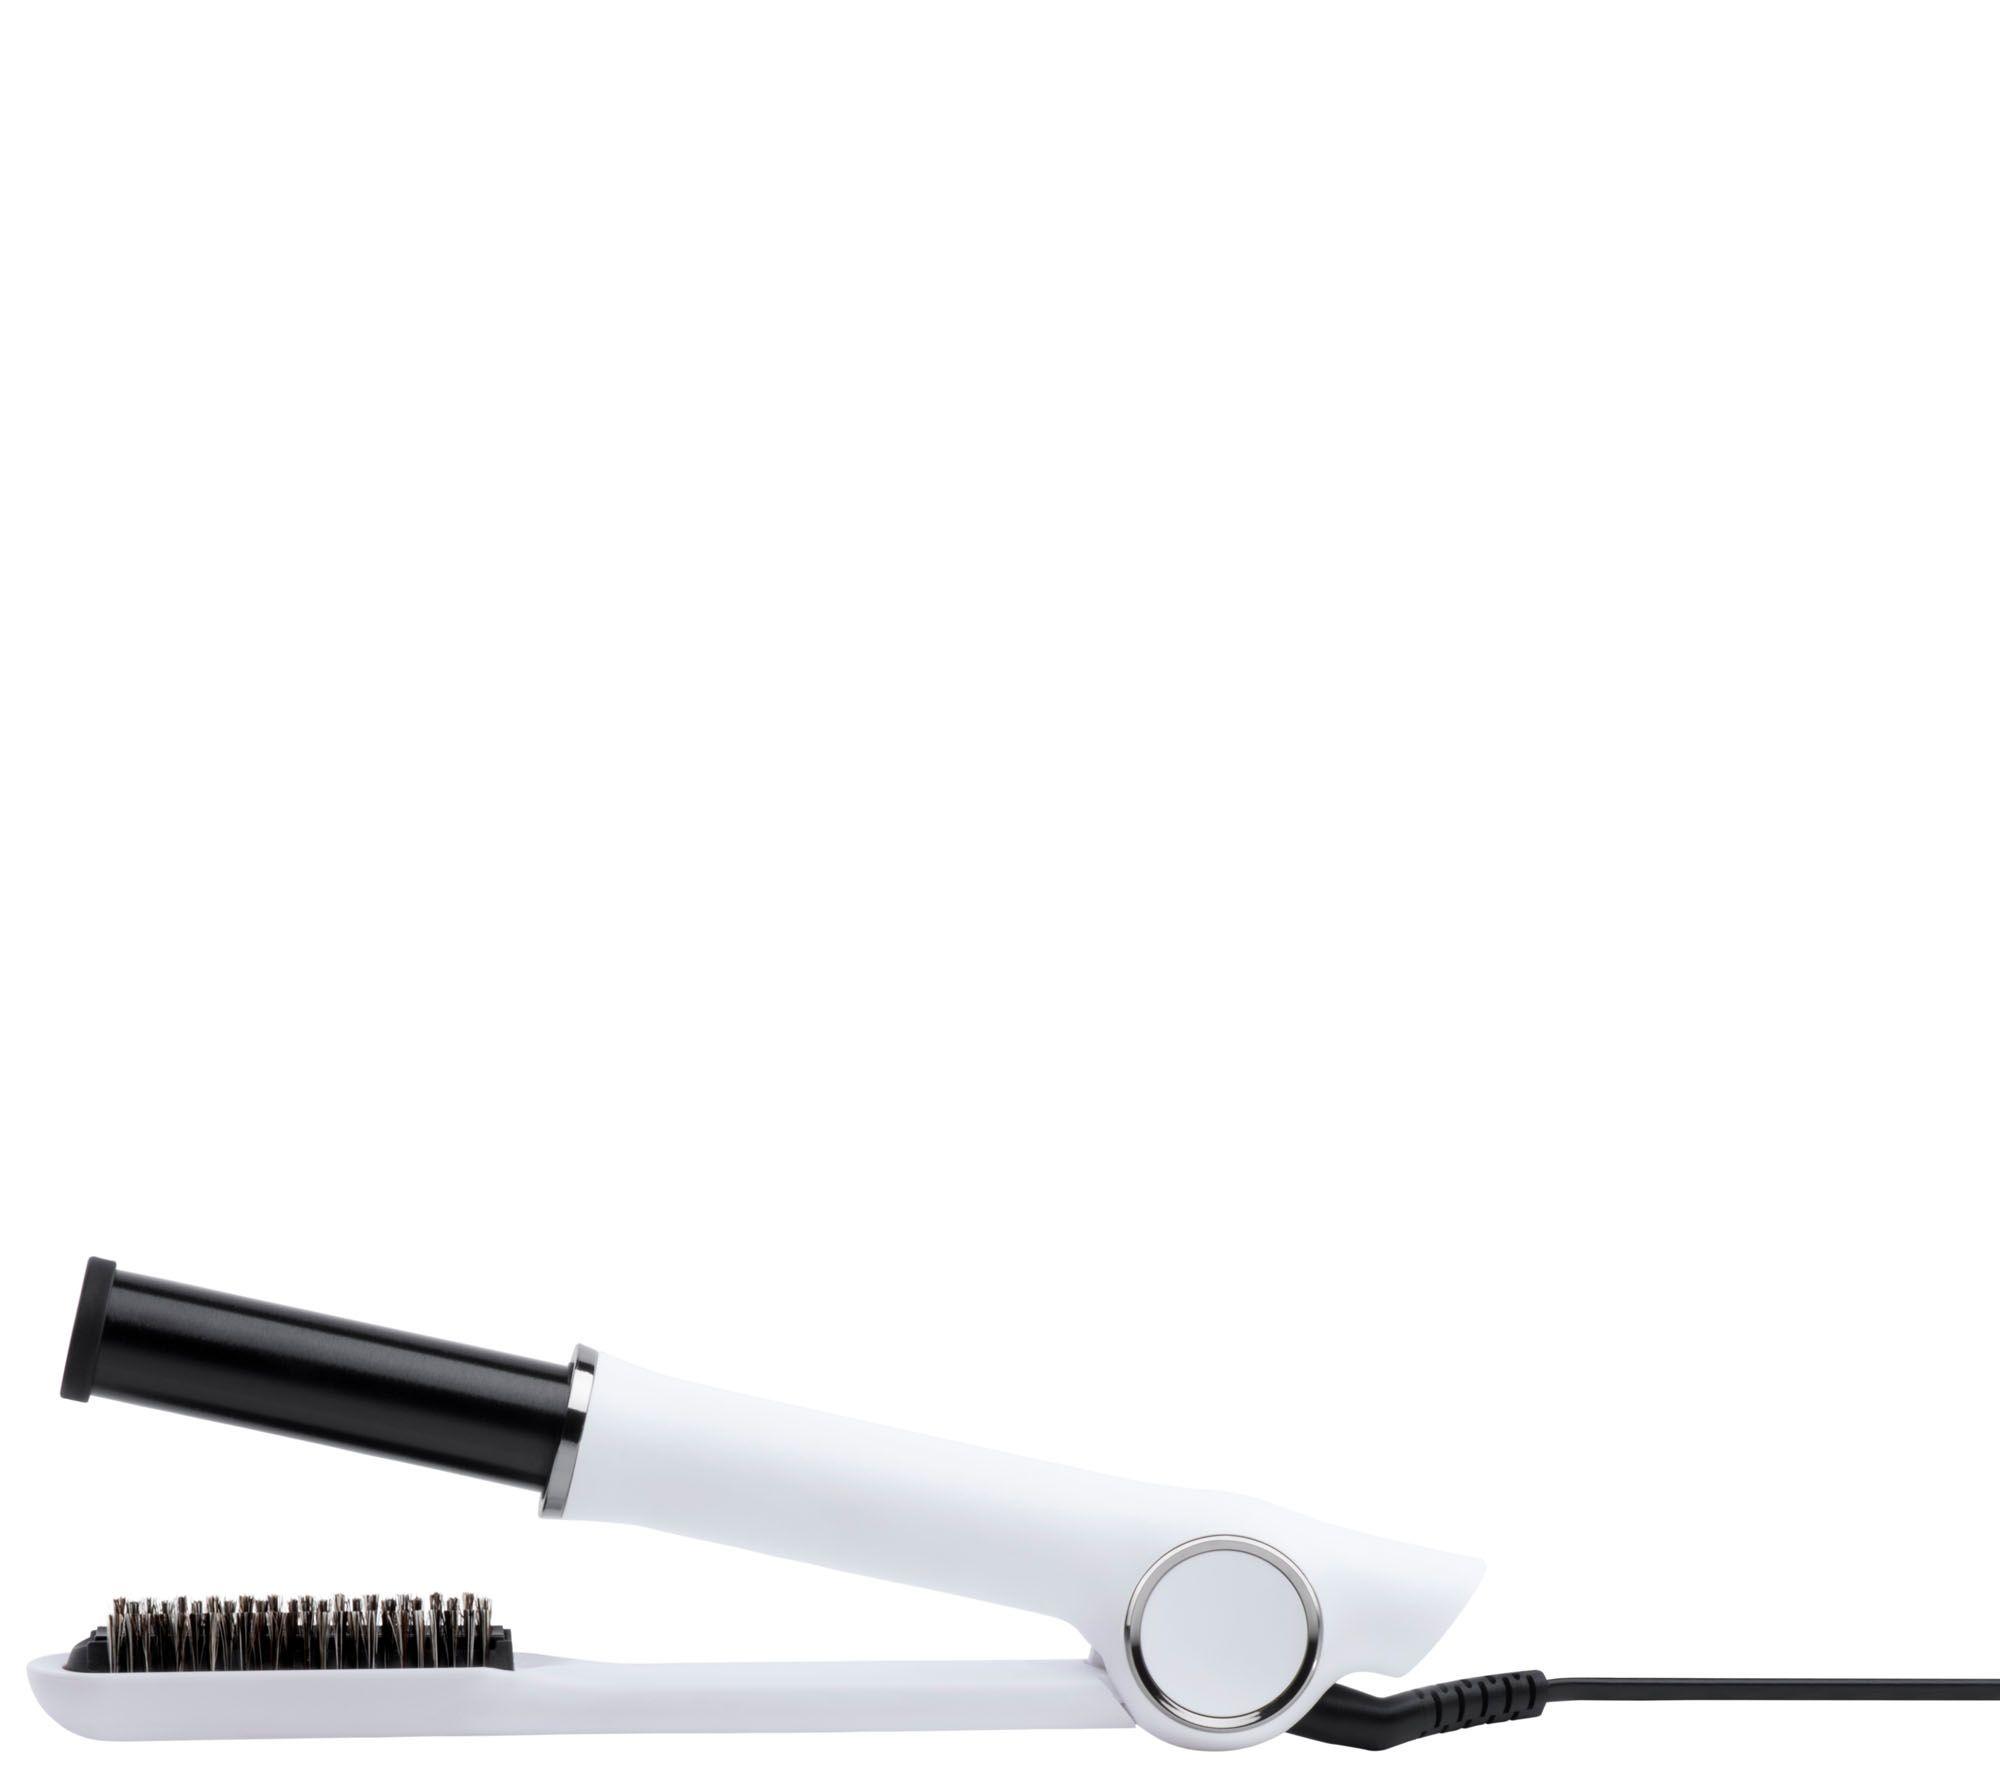 Instyler Airless Revolving Blowout Styler Page 1 The Wet Brush Tourmaline Medium